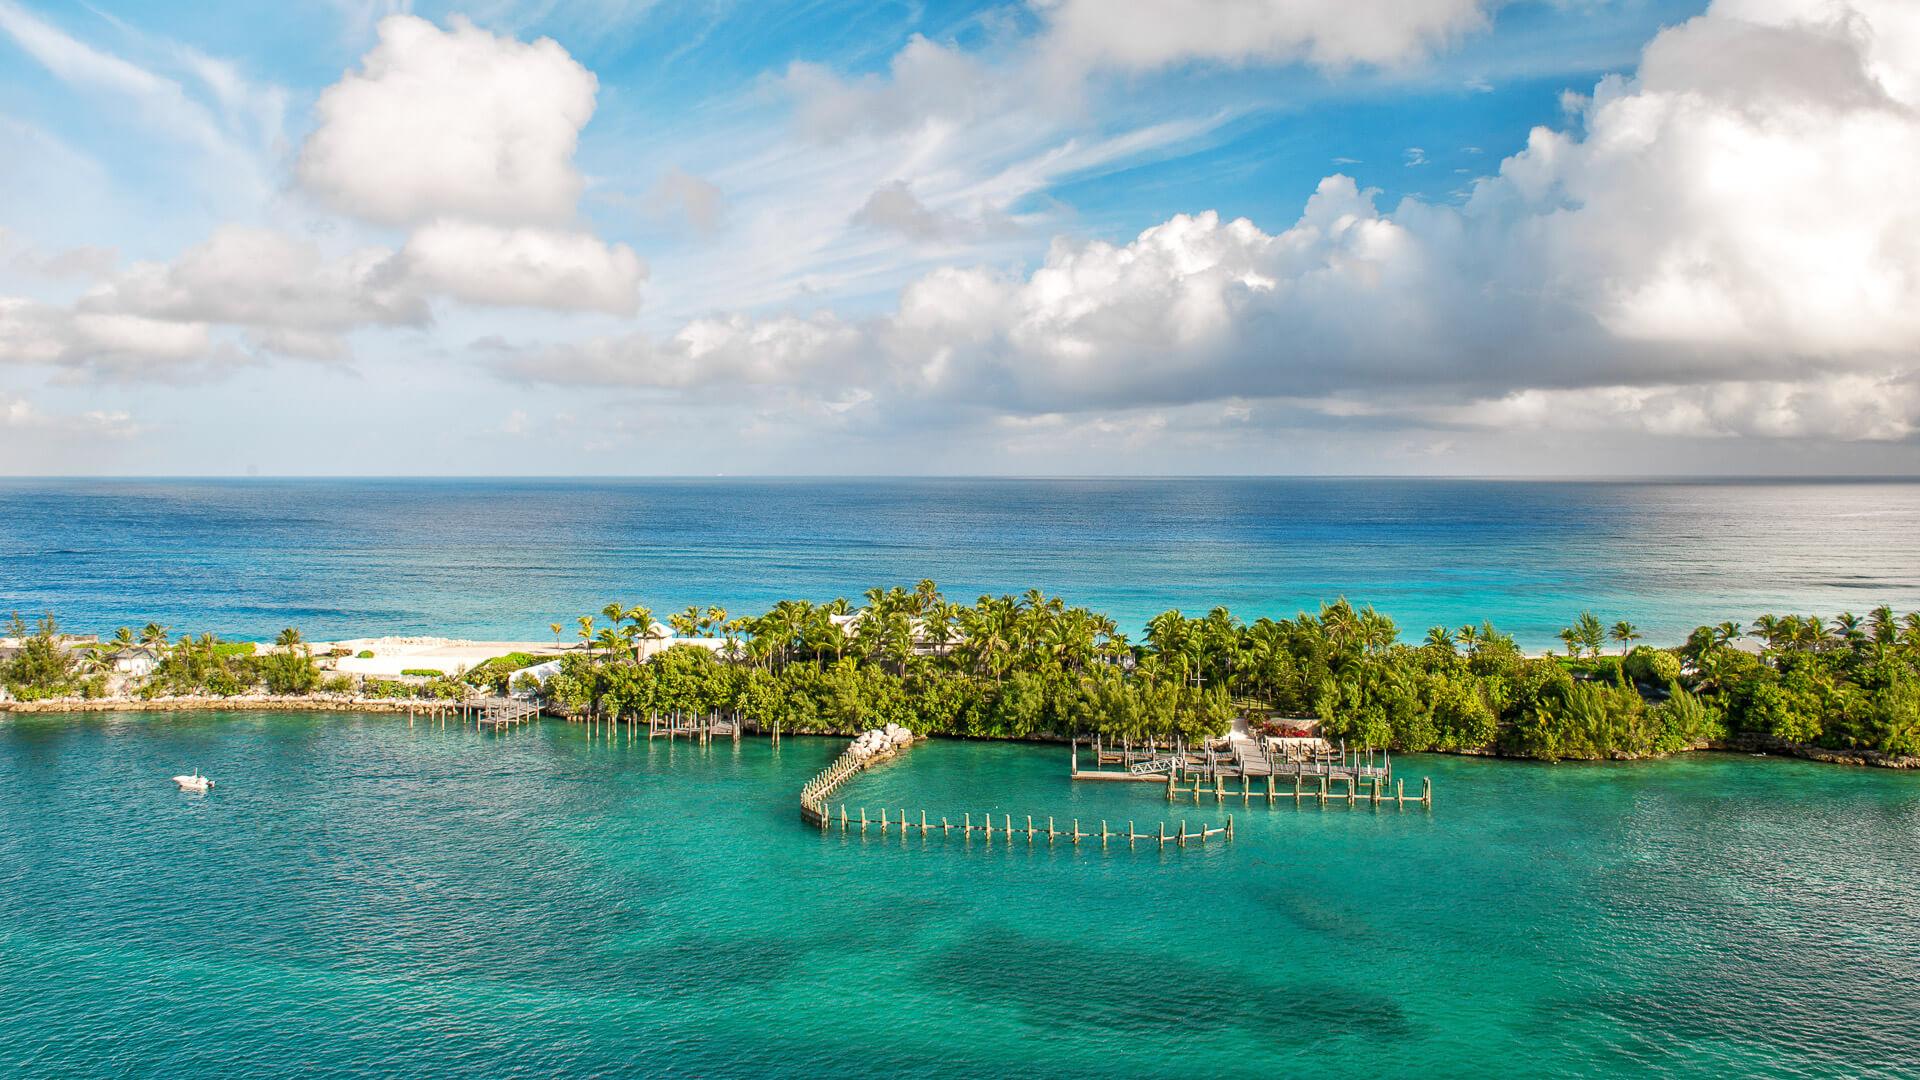 aerial view of Nassau Bahamas